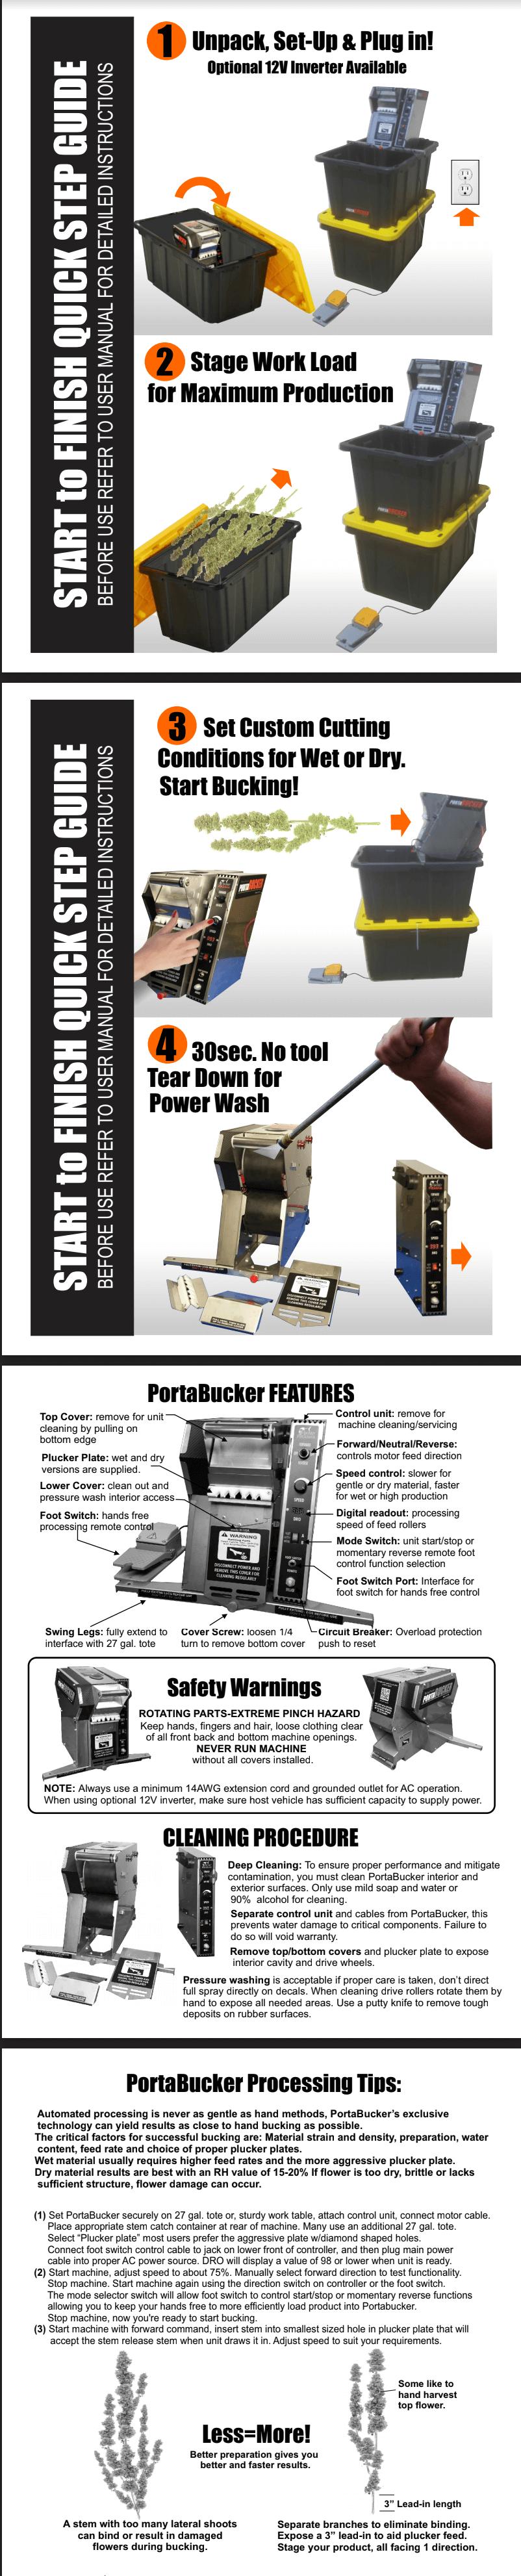 Porta Bucker Quick Start Guide